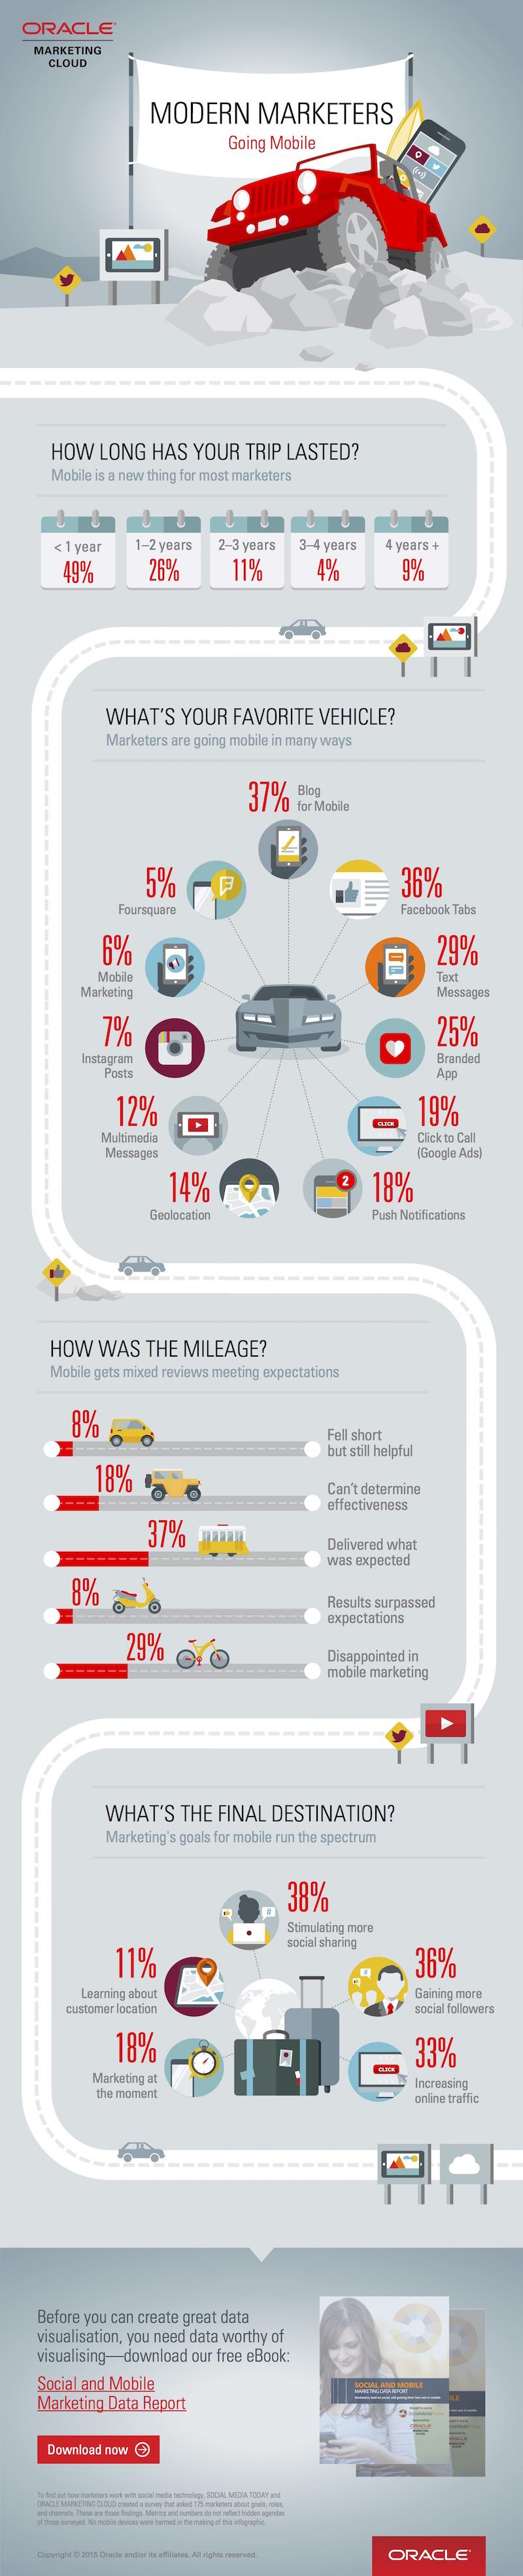 marketing-mobile-duo-en-devenir